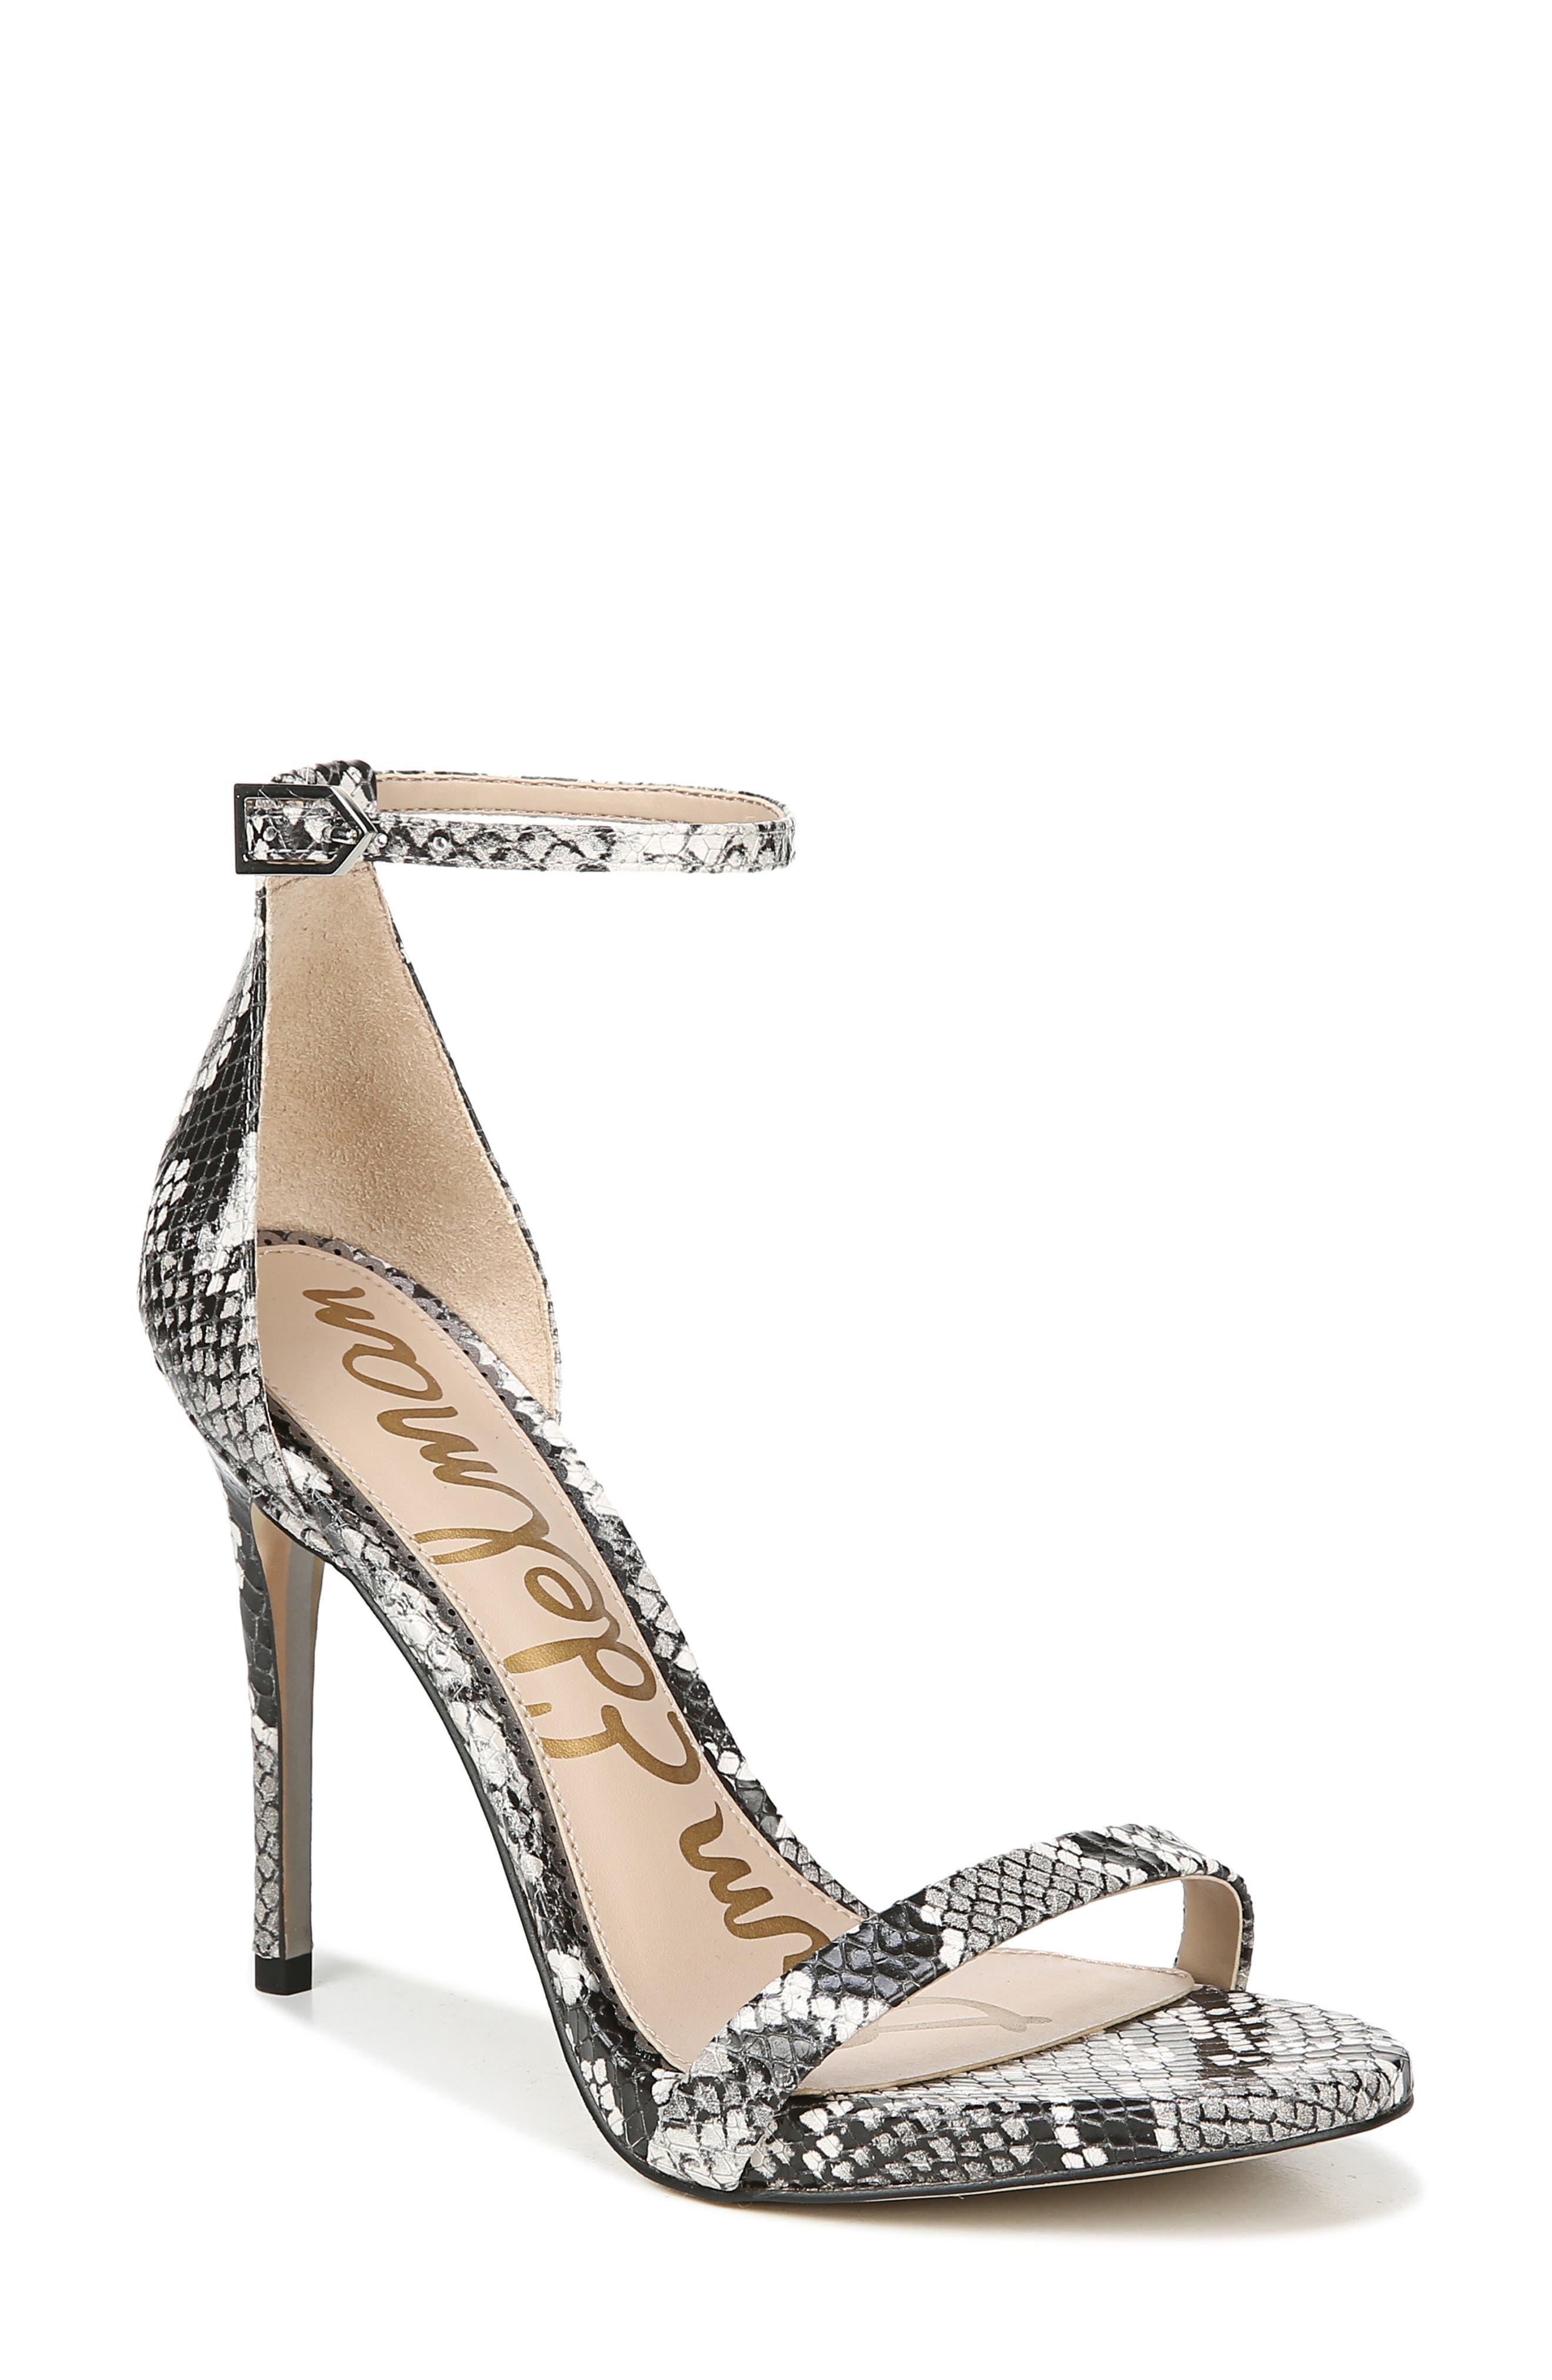 Ariella Ankle Strap Sandal,                             Main thumbnail 1, color,                             005